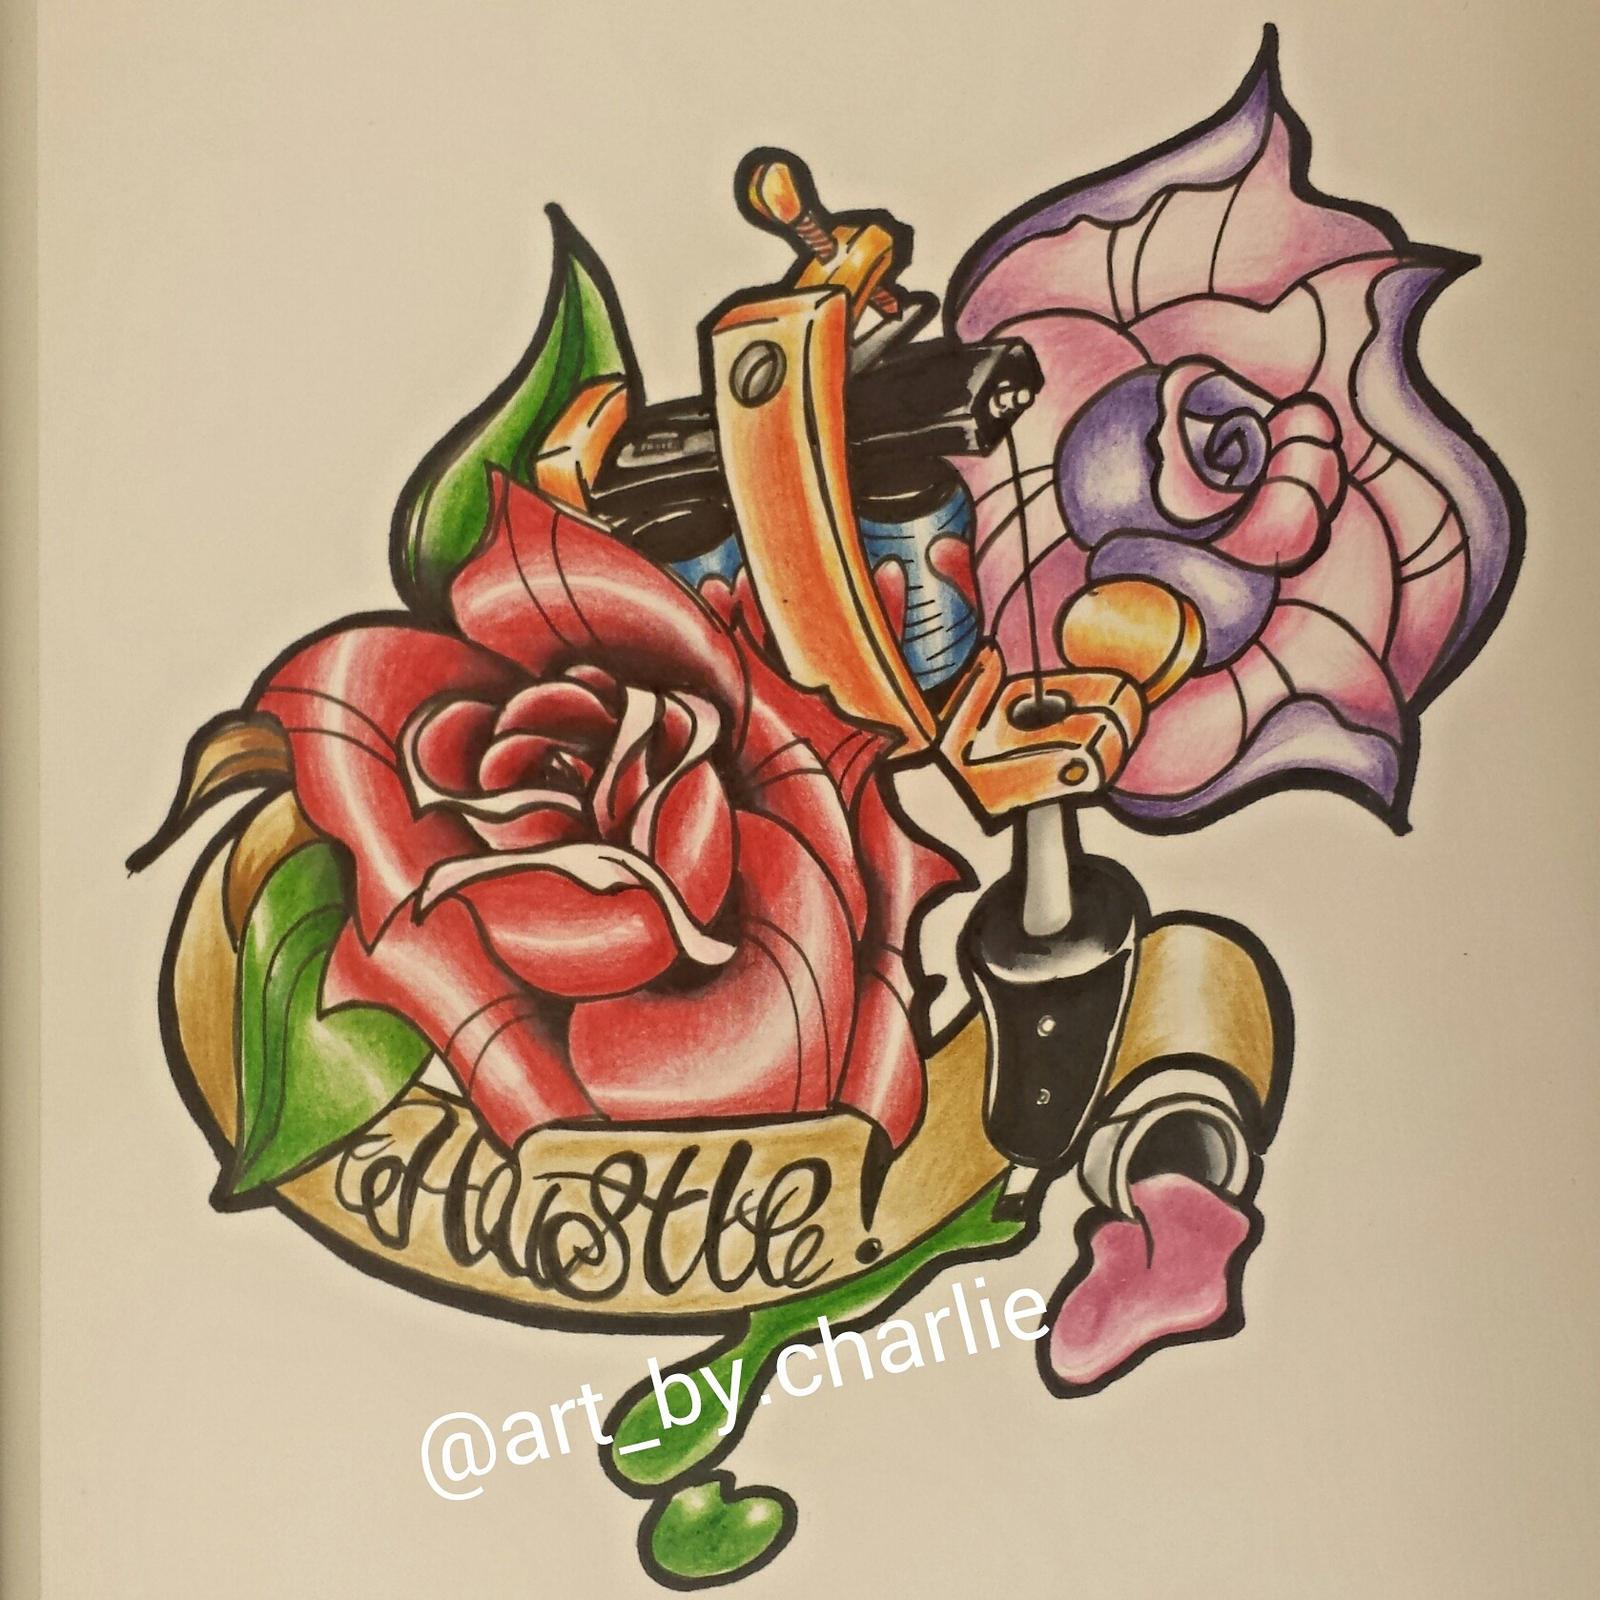 new school rose tattoo designs. Black Bedroom Furniture Sets. Home Design Ideas